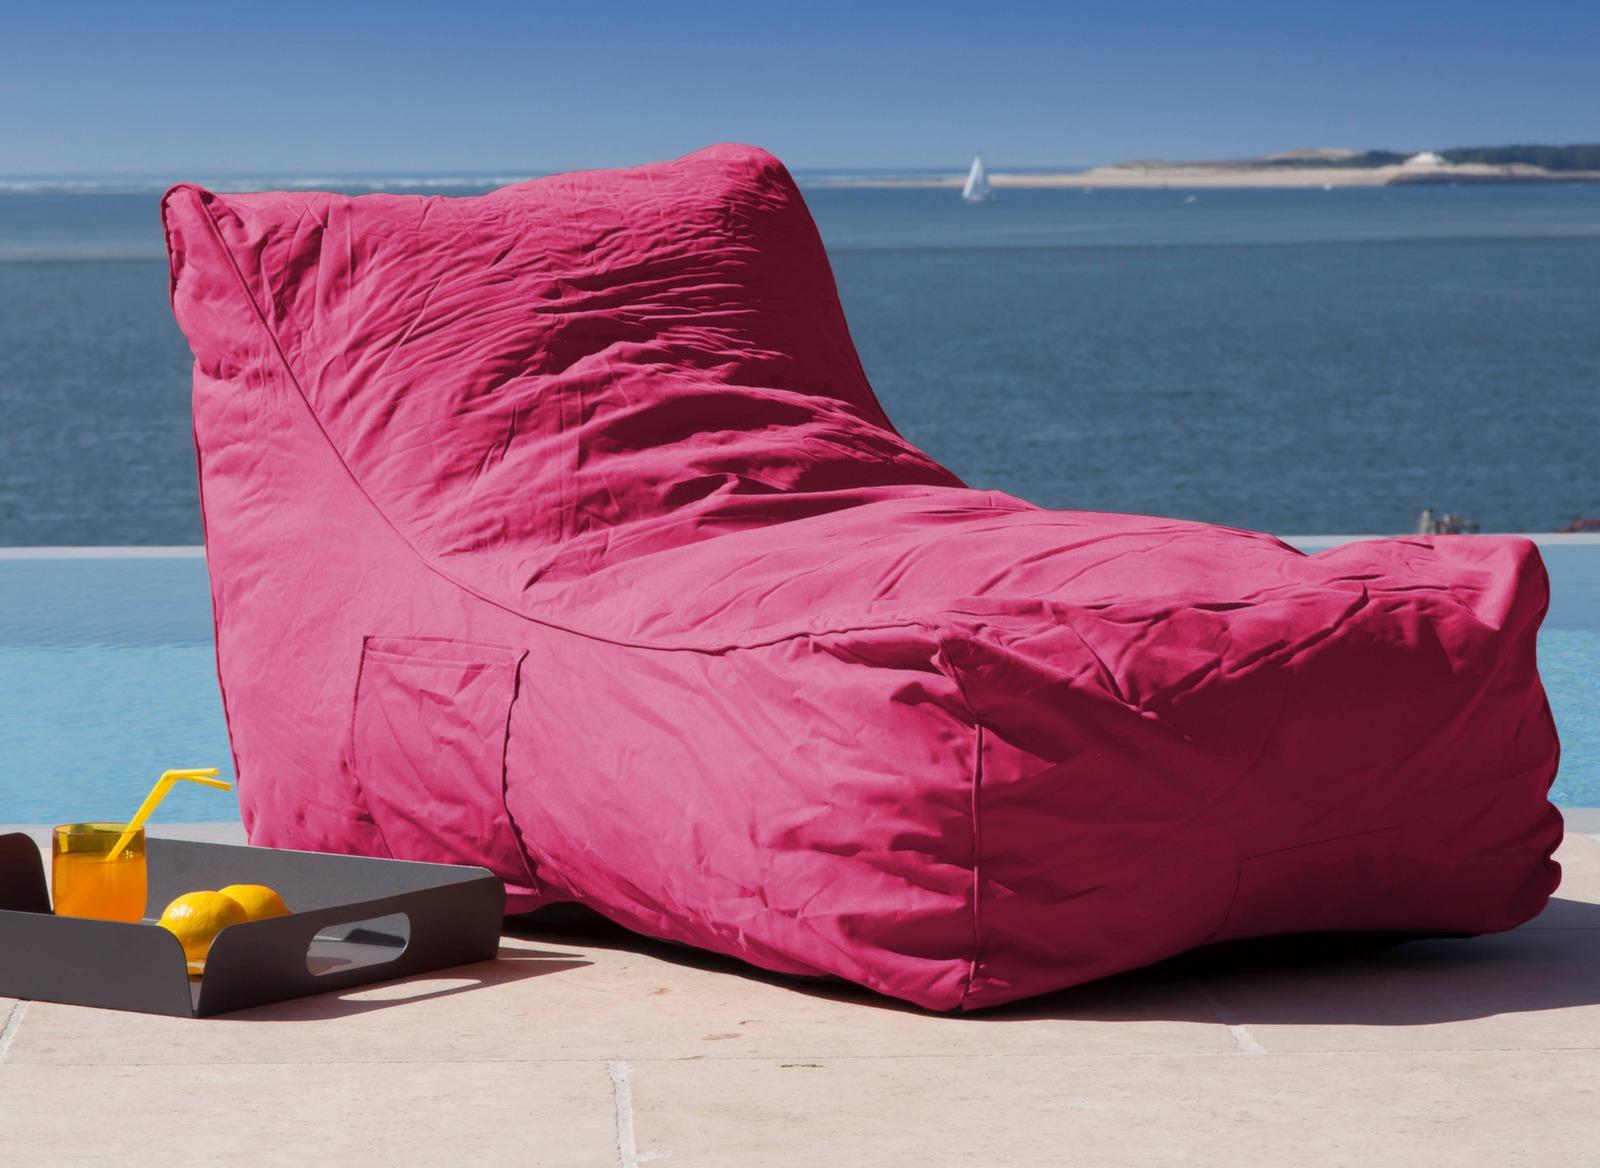 lit de soleil pouf malibu promotions meubles jardin proloisirs. Black Bedroom Furniture Sets. Home Design Ideas